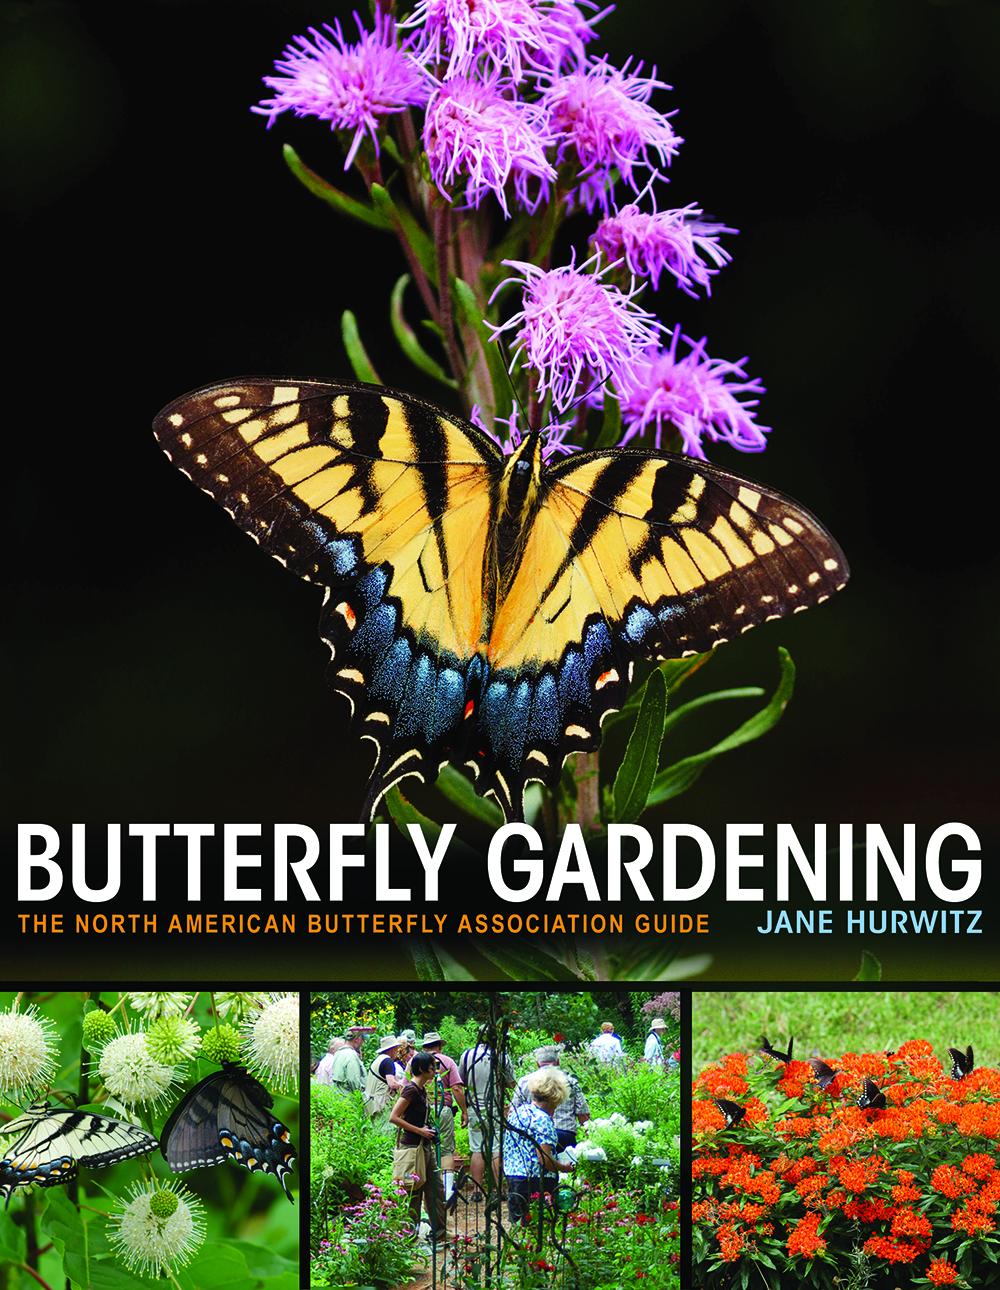 Butterfly Gardening Book Jane Hurwitz.jpg